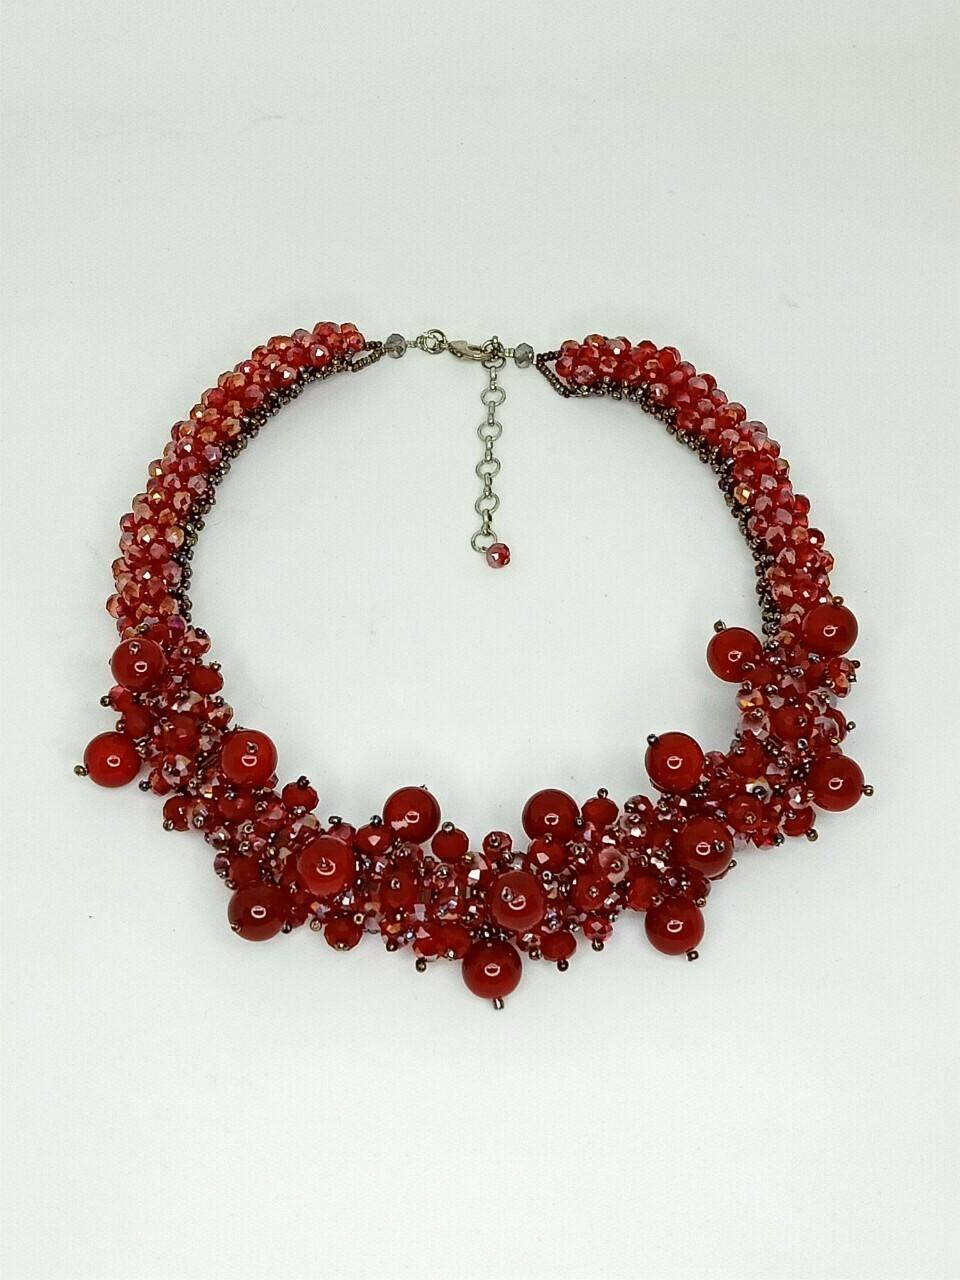 Cherry-licious Choker Necklace